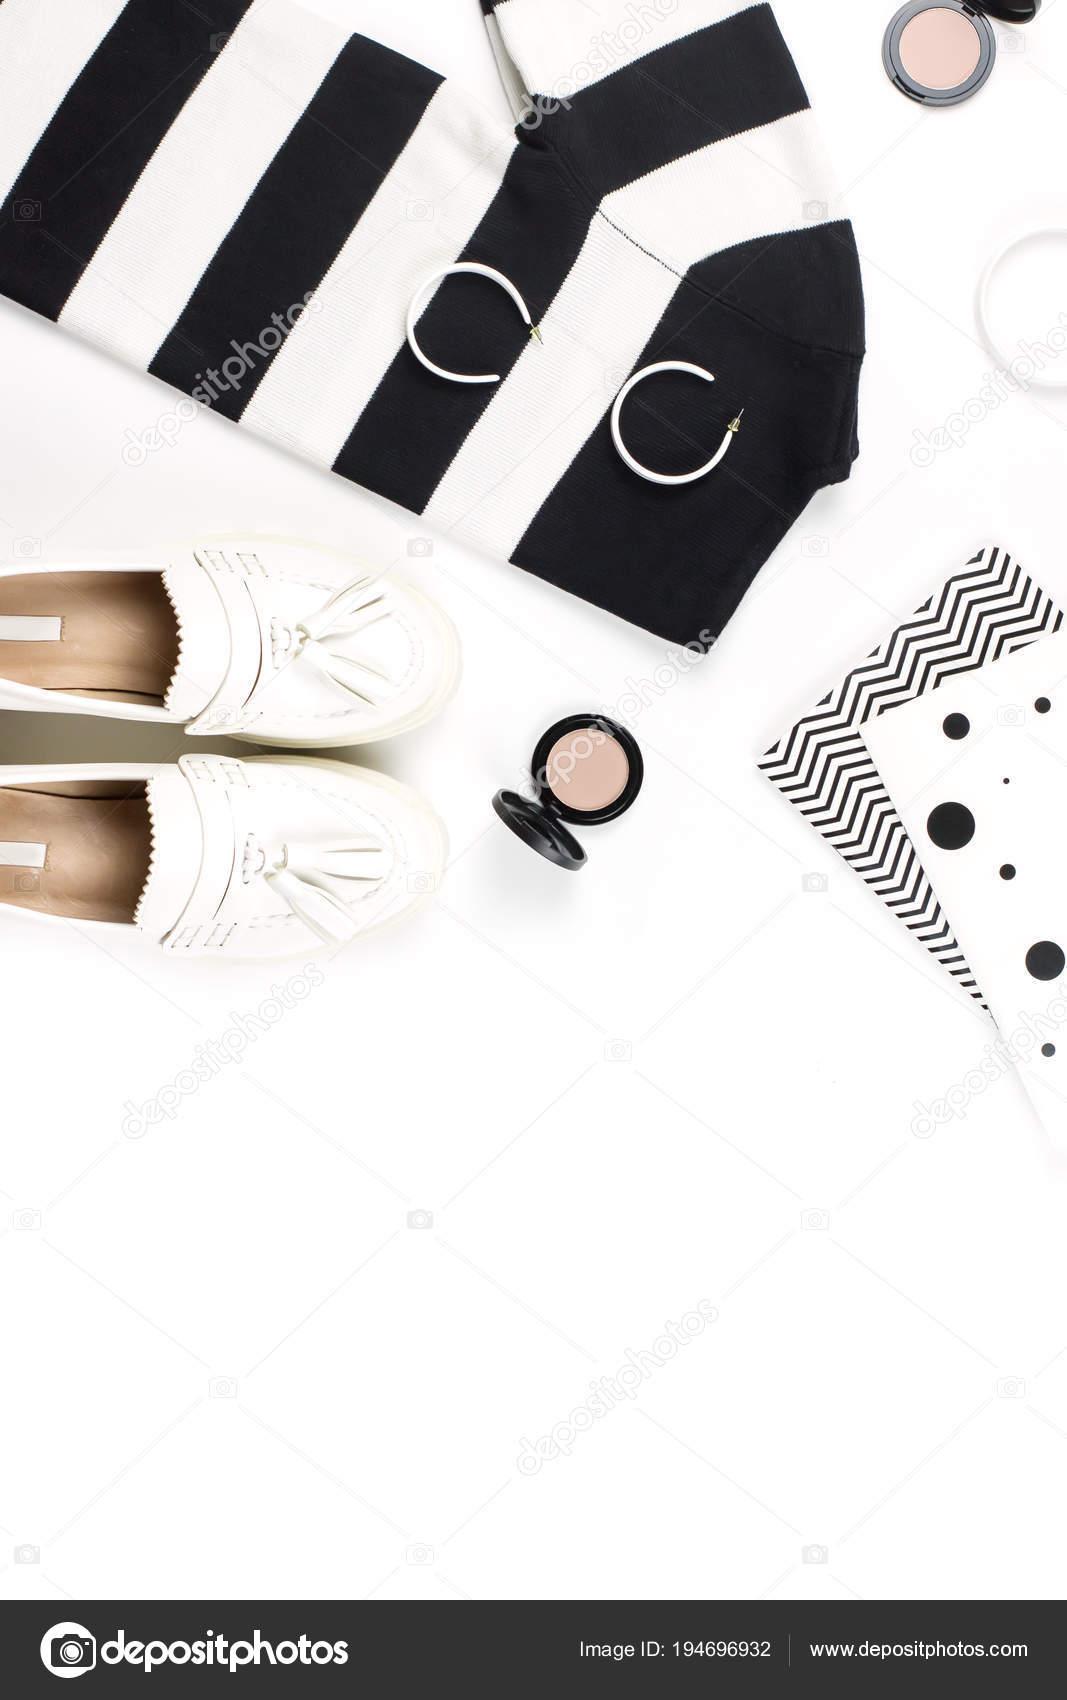 2496a4691609 Γυναίκα ρούχα casual στυλ και τη μόδα αξεσουάρ επίπεδη lay. Μοντέρνα σχέδια  και τυπωμένες ύλες έννοια — Εικόνα από marythepooh